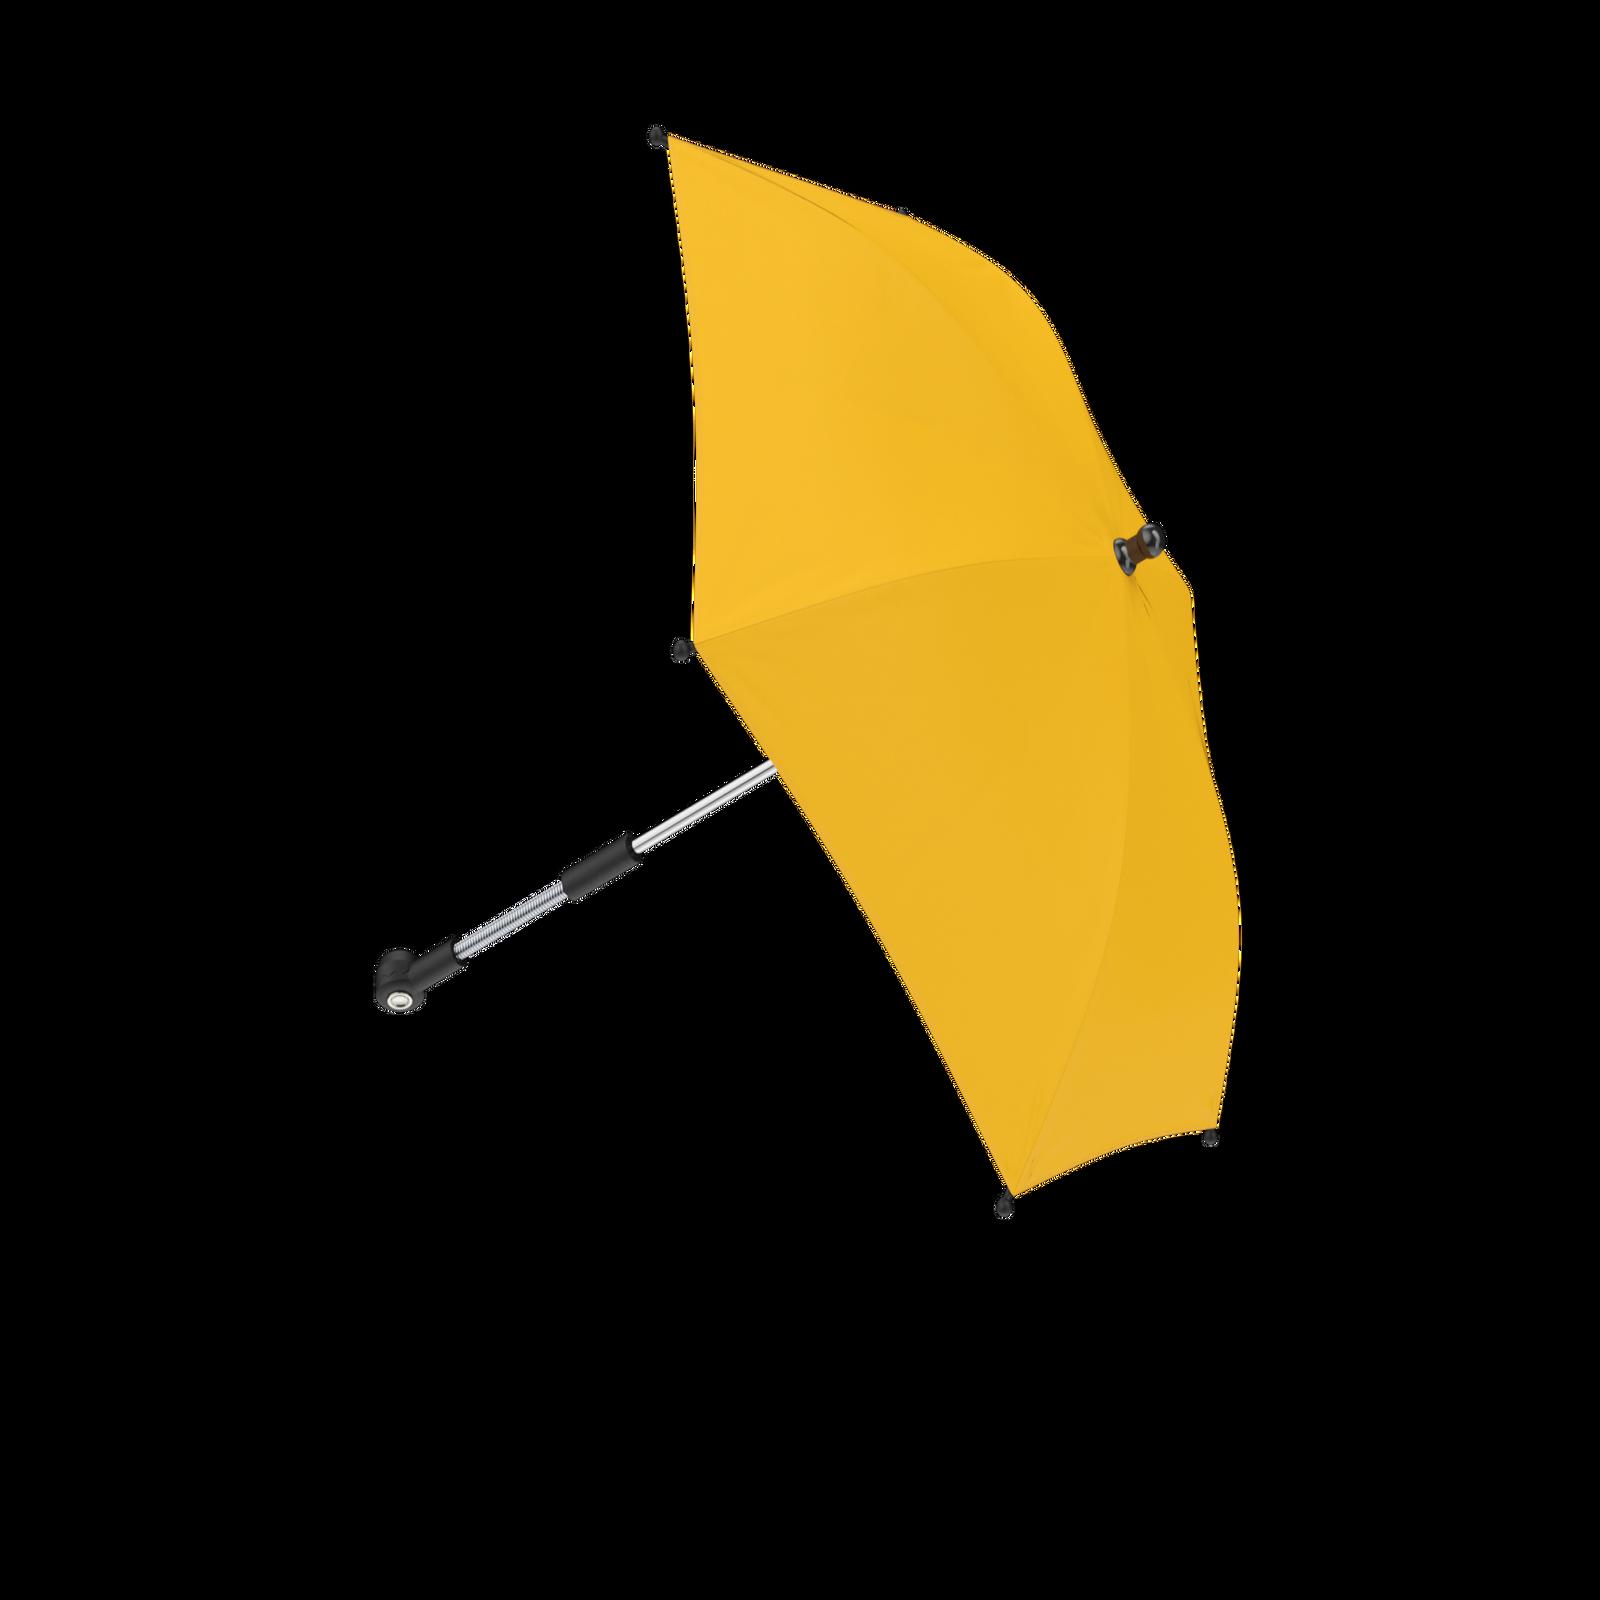 Bugaboo parasol